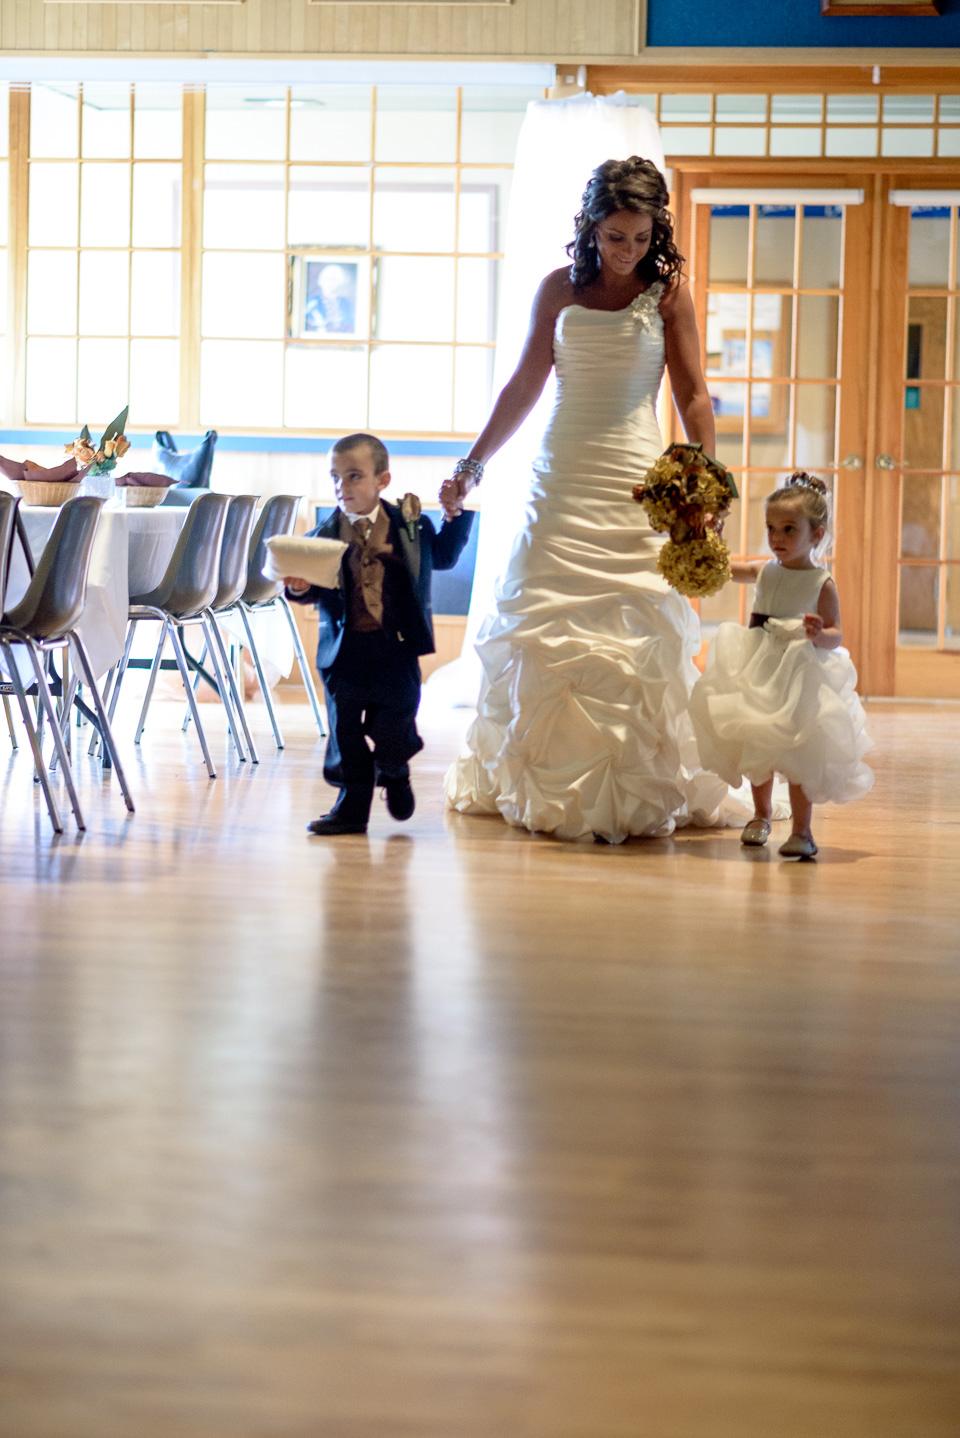 NIgel Fearon Photography | The LeBlanc Wedding-33.jpg